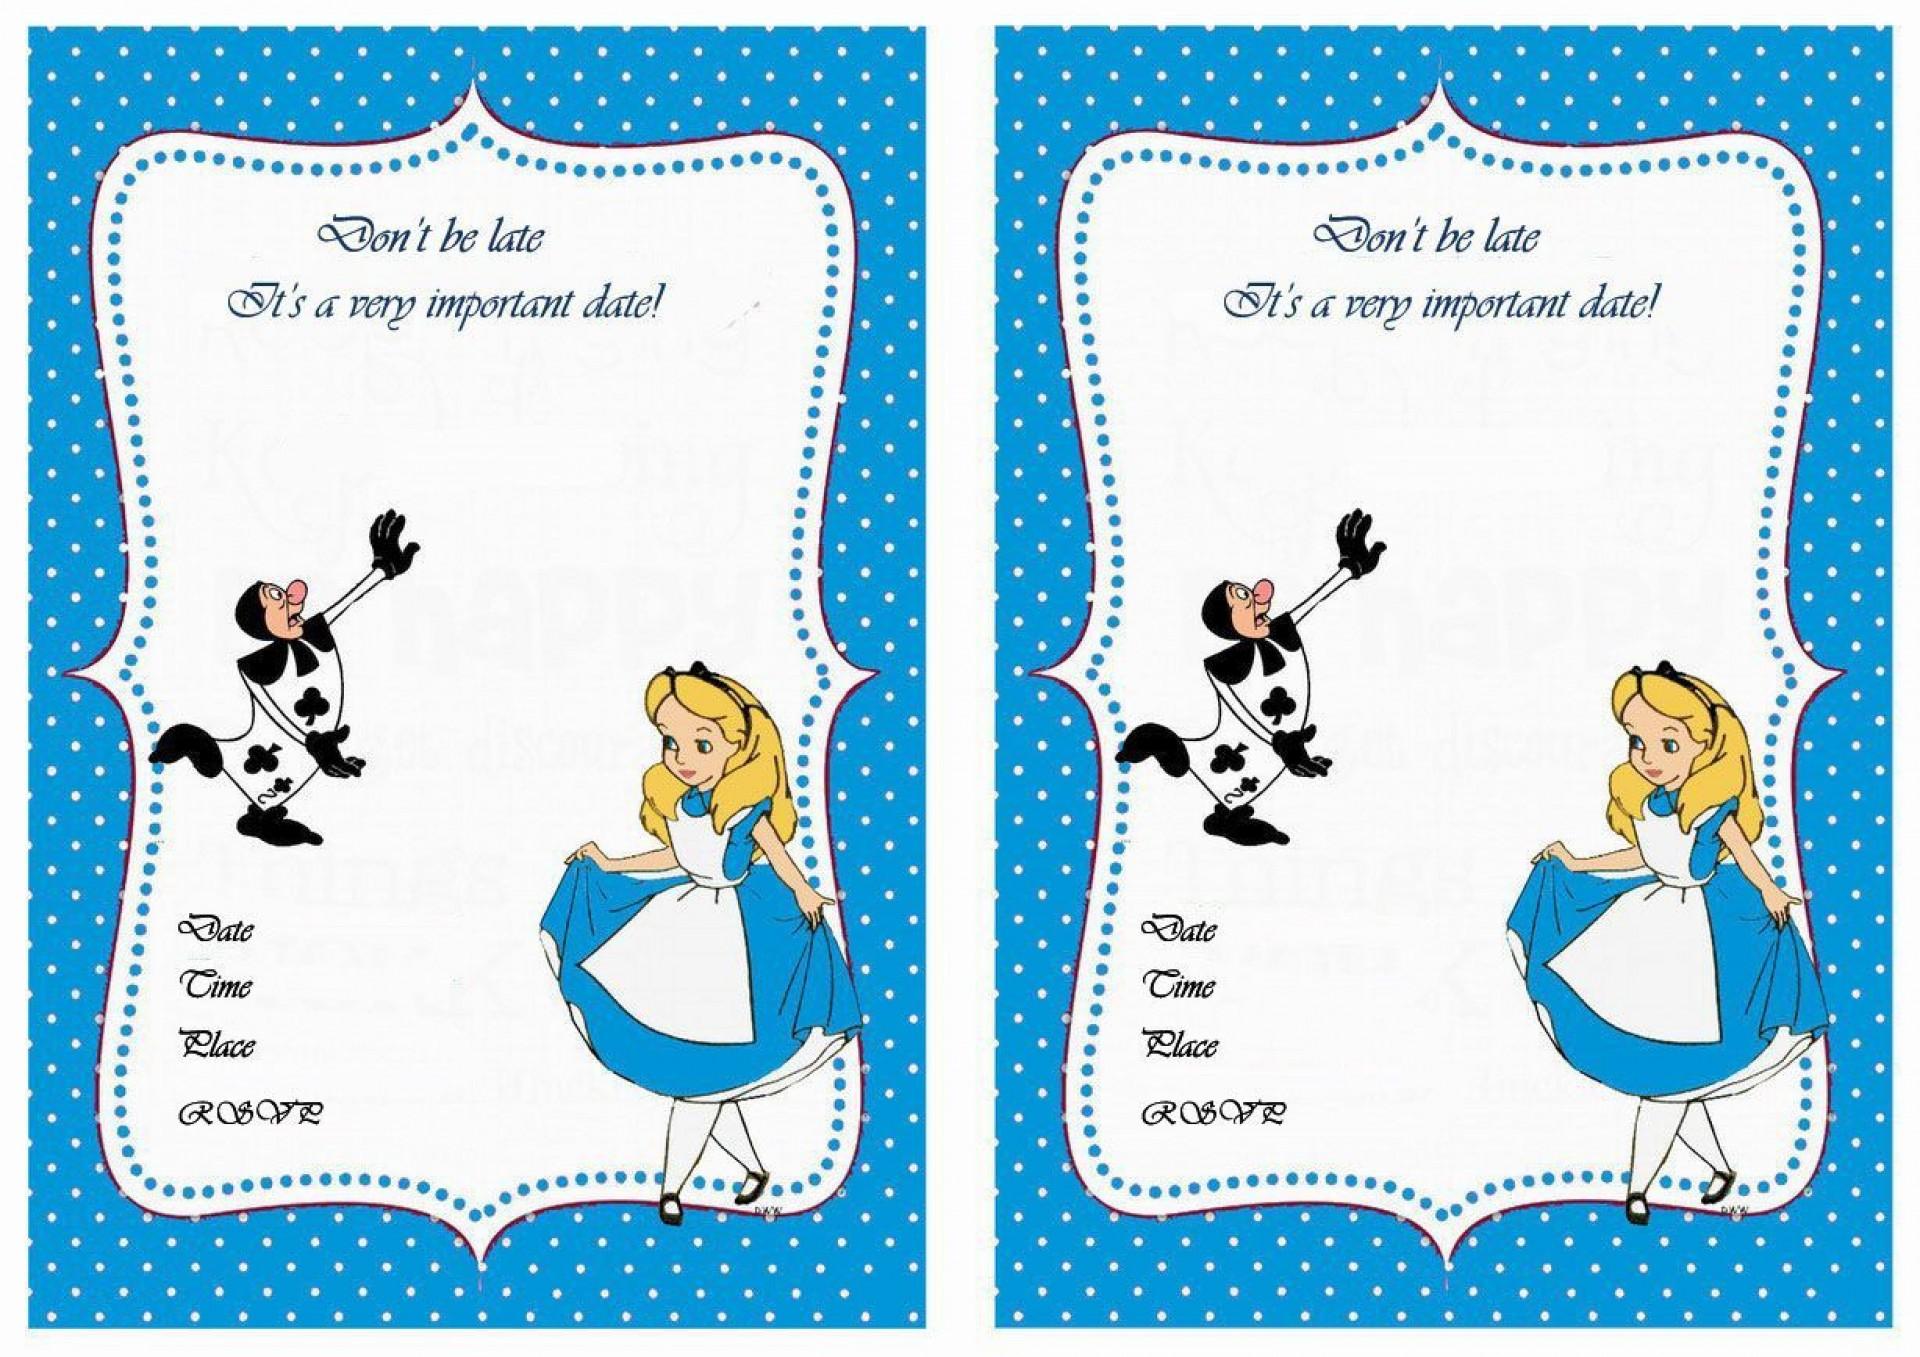 004 Impressive Alice In Wonderland Invitation Template Sample  Templates Wedding Birthday Free Tea Party1920